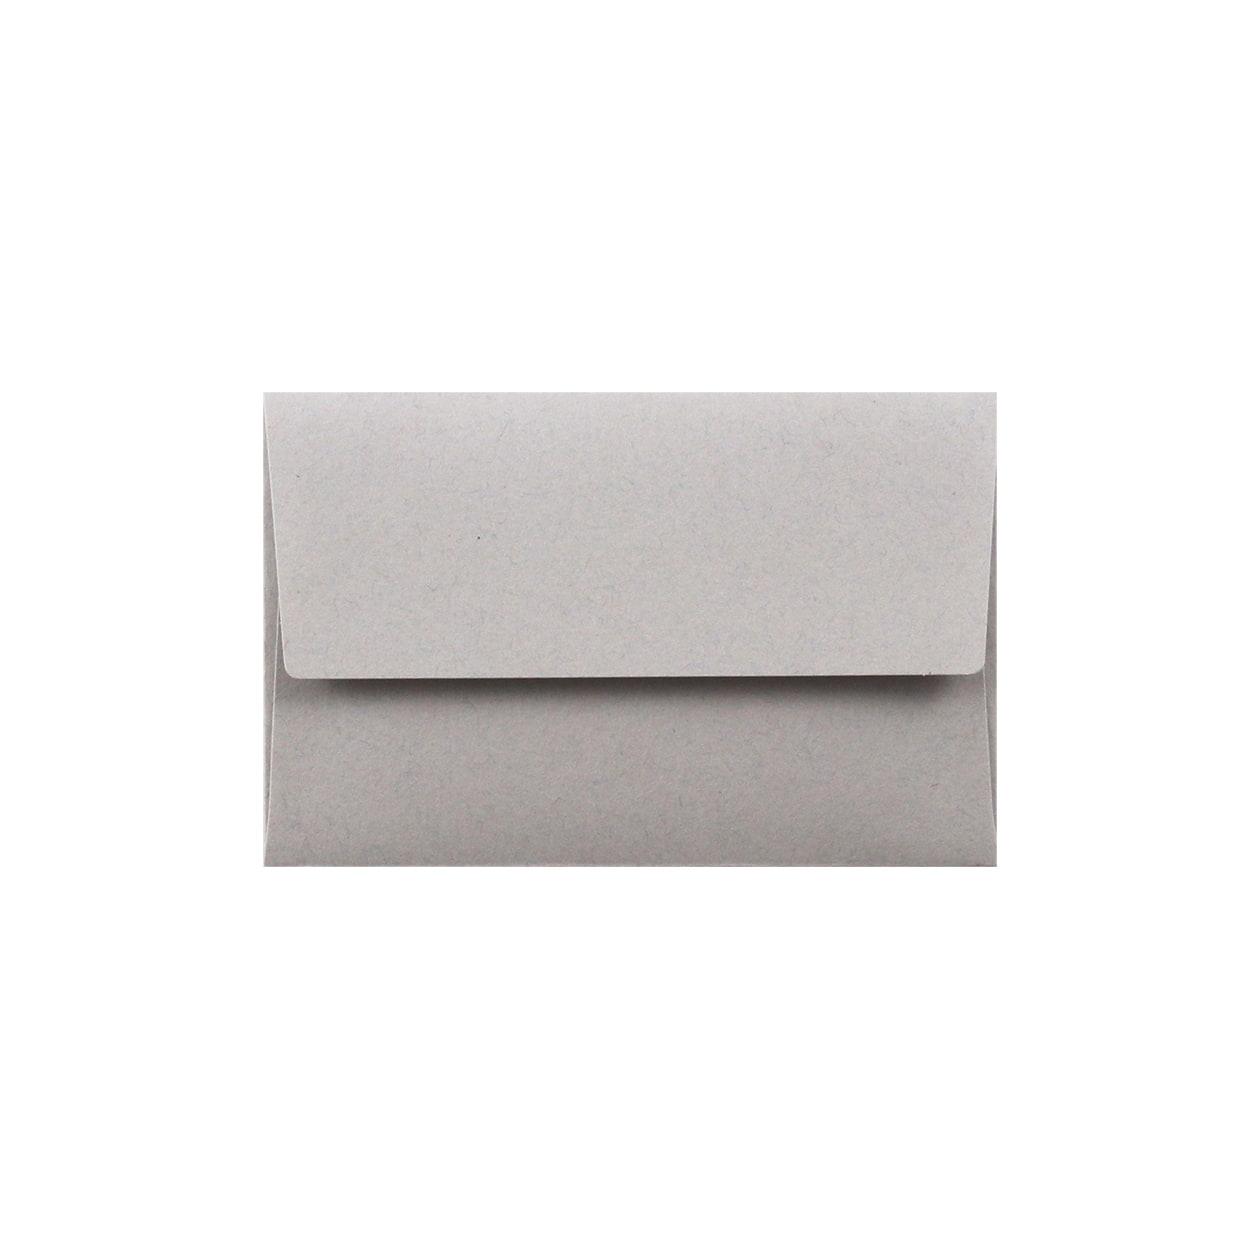 NEカマス封筒 HAGURUMA Basic ライナーグレイ 100g